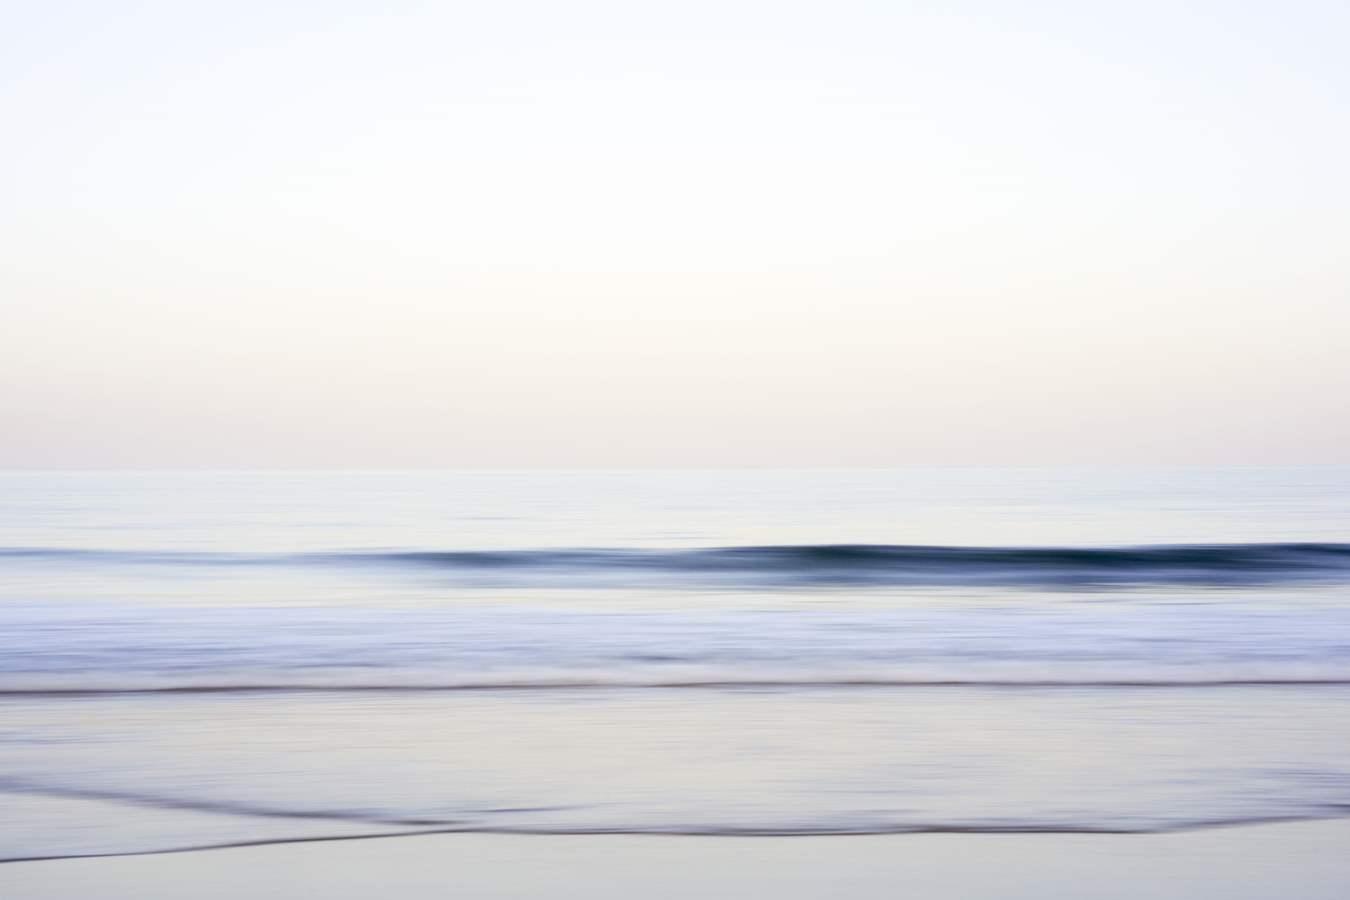 Atlantic Ocean IV 201... by  Alison Shaw - Masterpiece Online